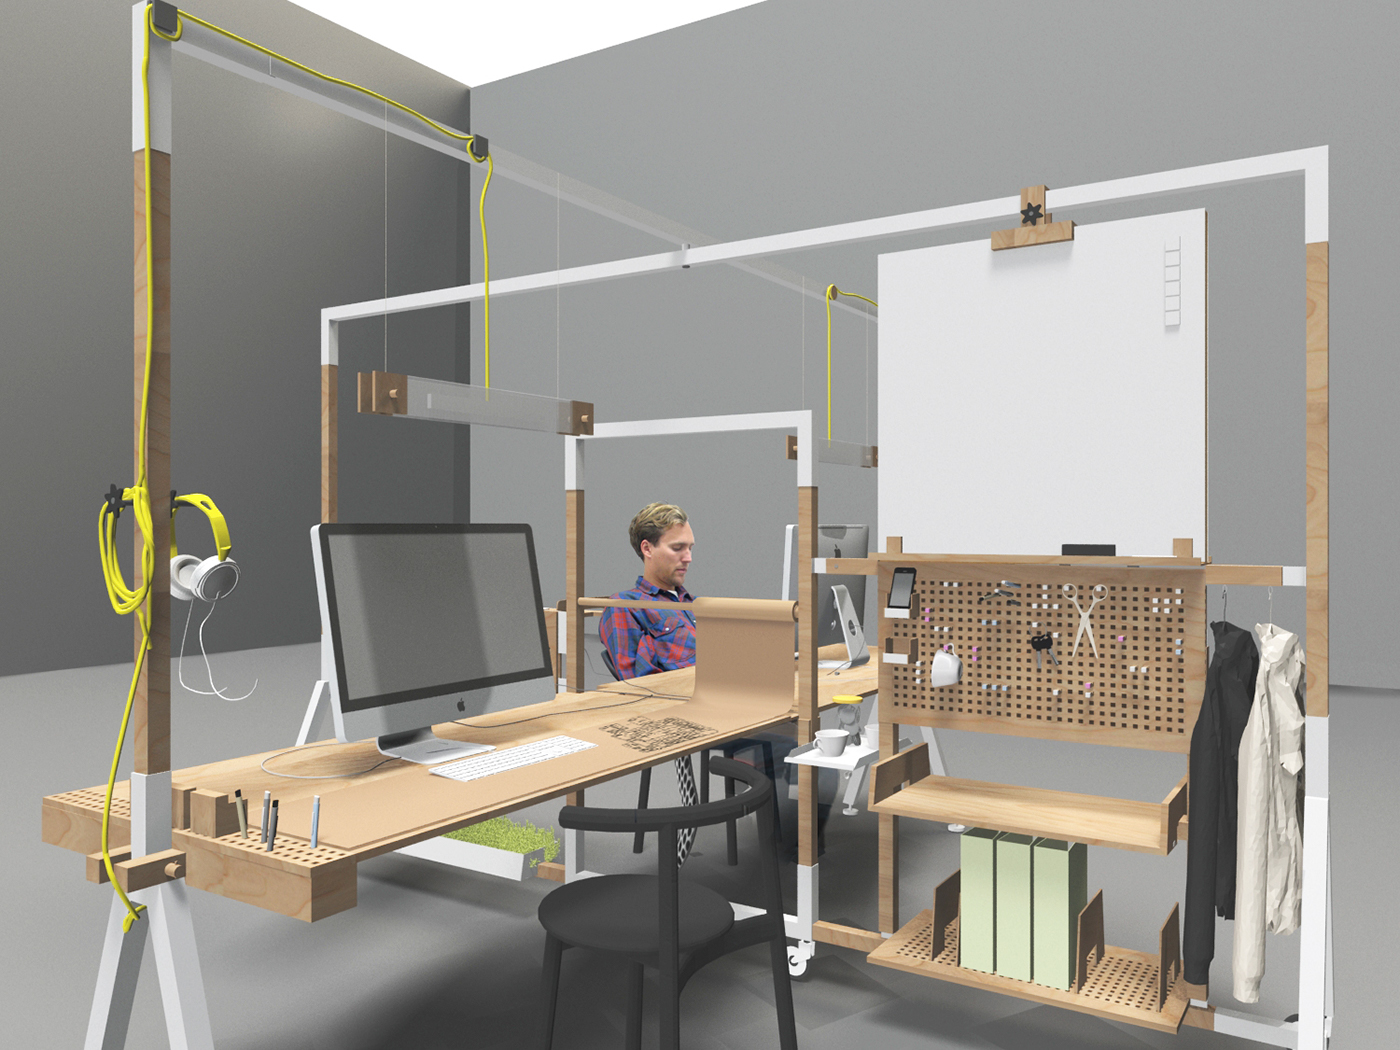 furniture office furniture desk Open office Startup Office workstation Workplace Design workplace Office